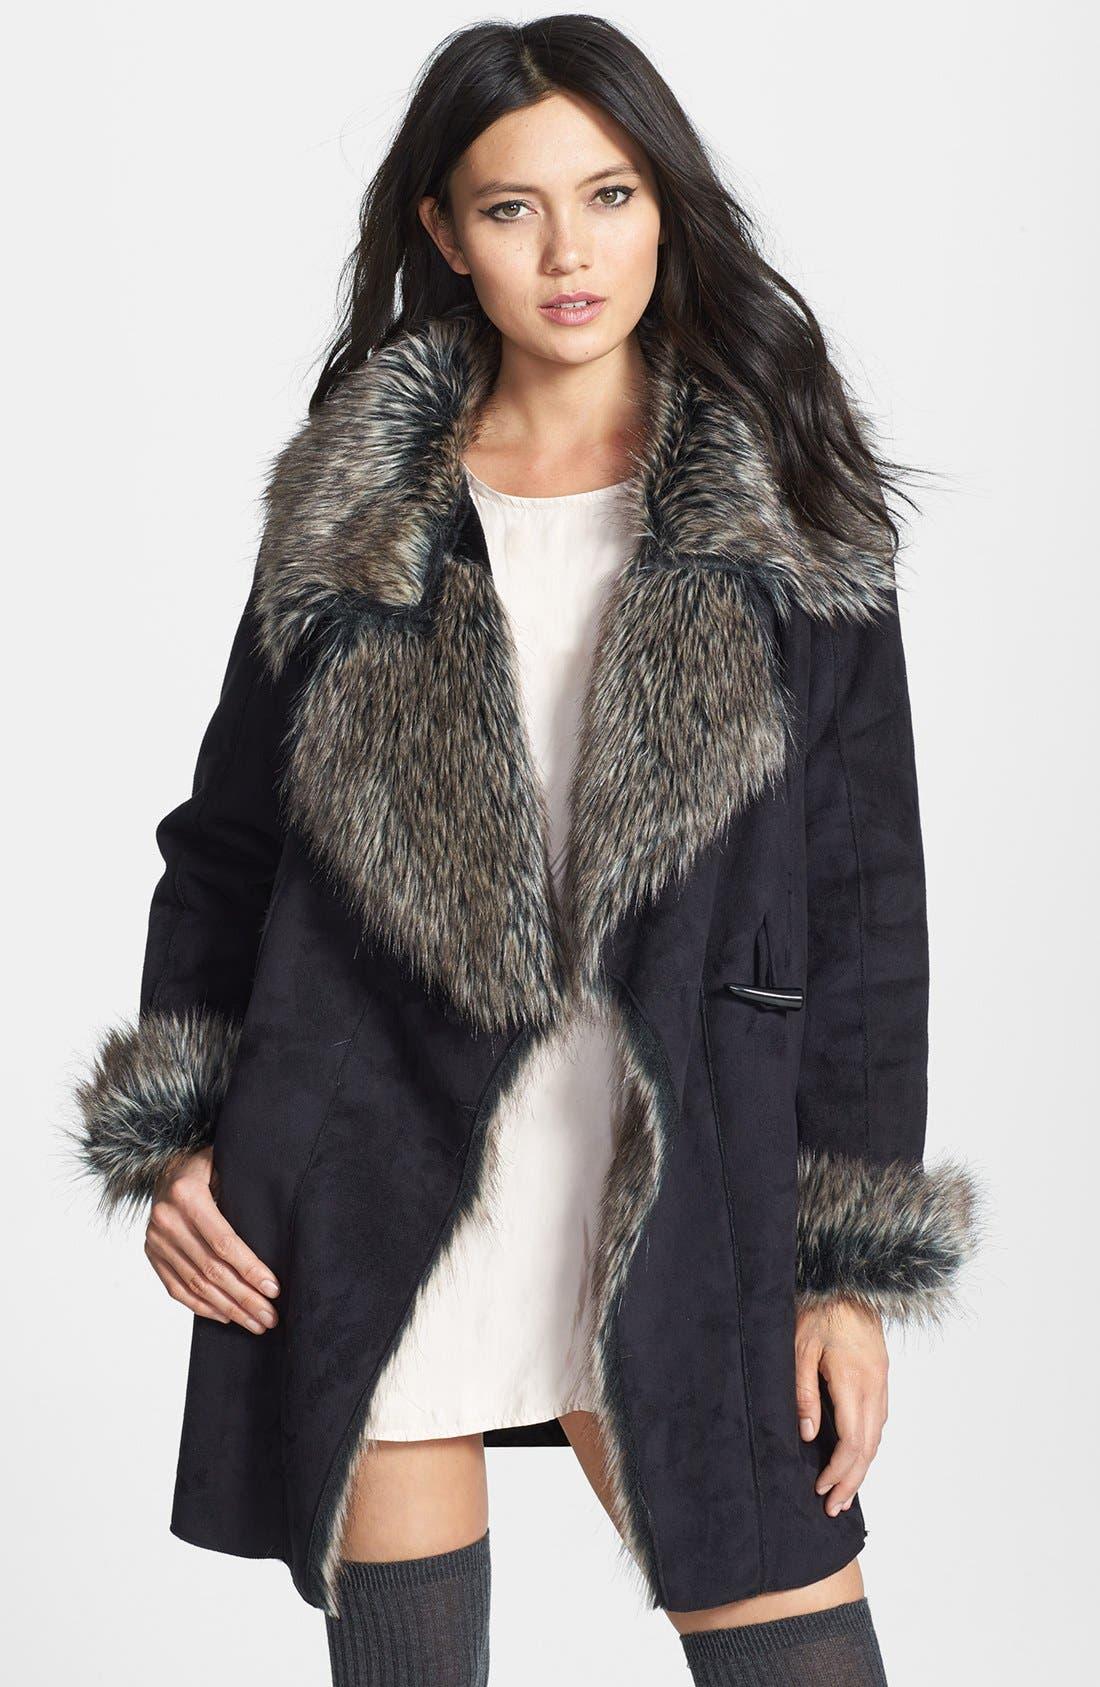 Alternate Image 1 Selected - Romeo & Juliet Couture Faux Fur Trim Faux Suede Jacket